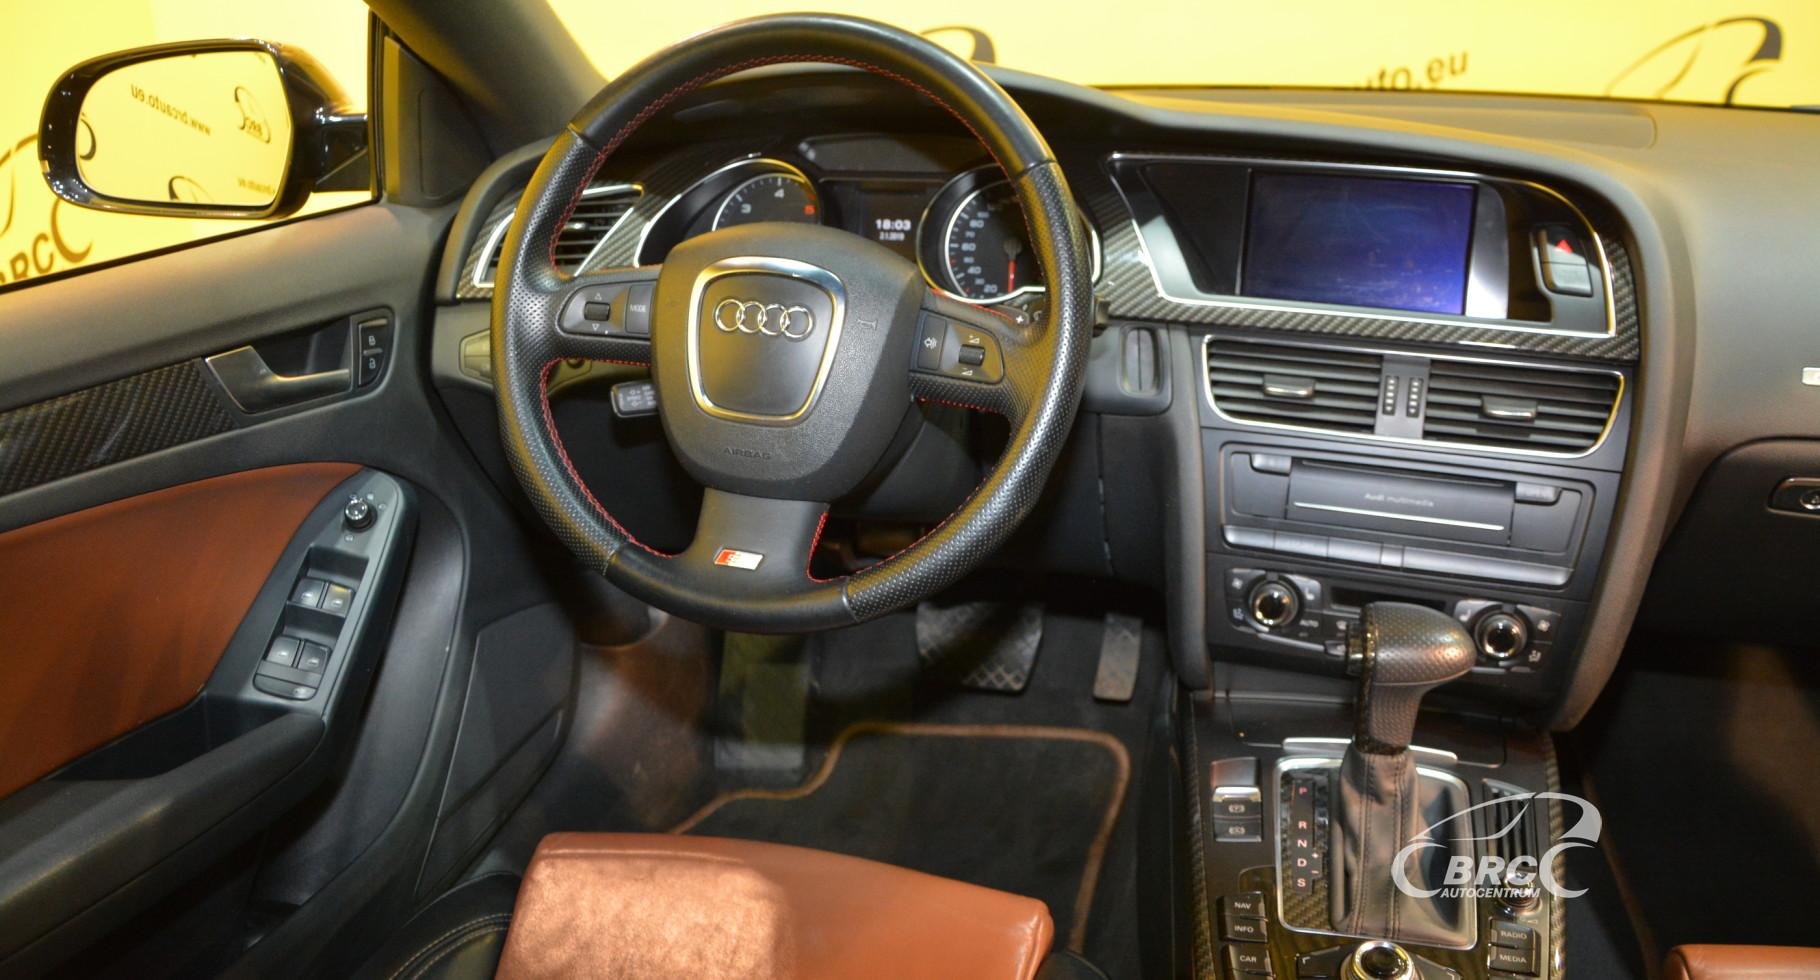 Audi A5 Sportback 3.0 TDI V6 S-Line Quattro Automatas